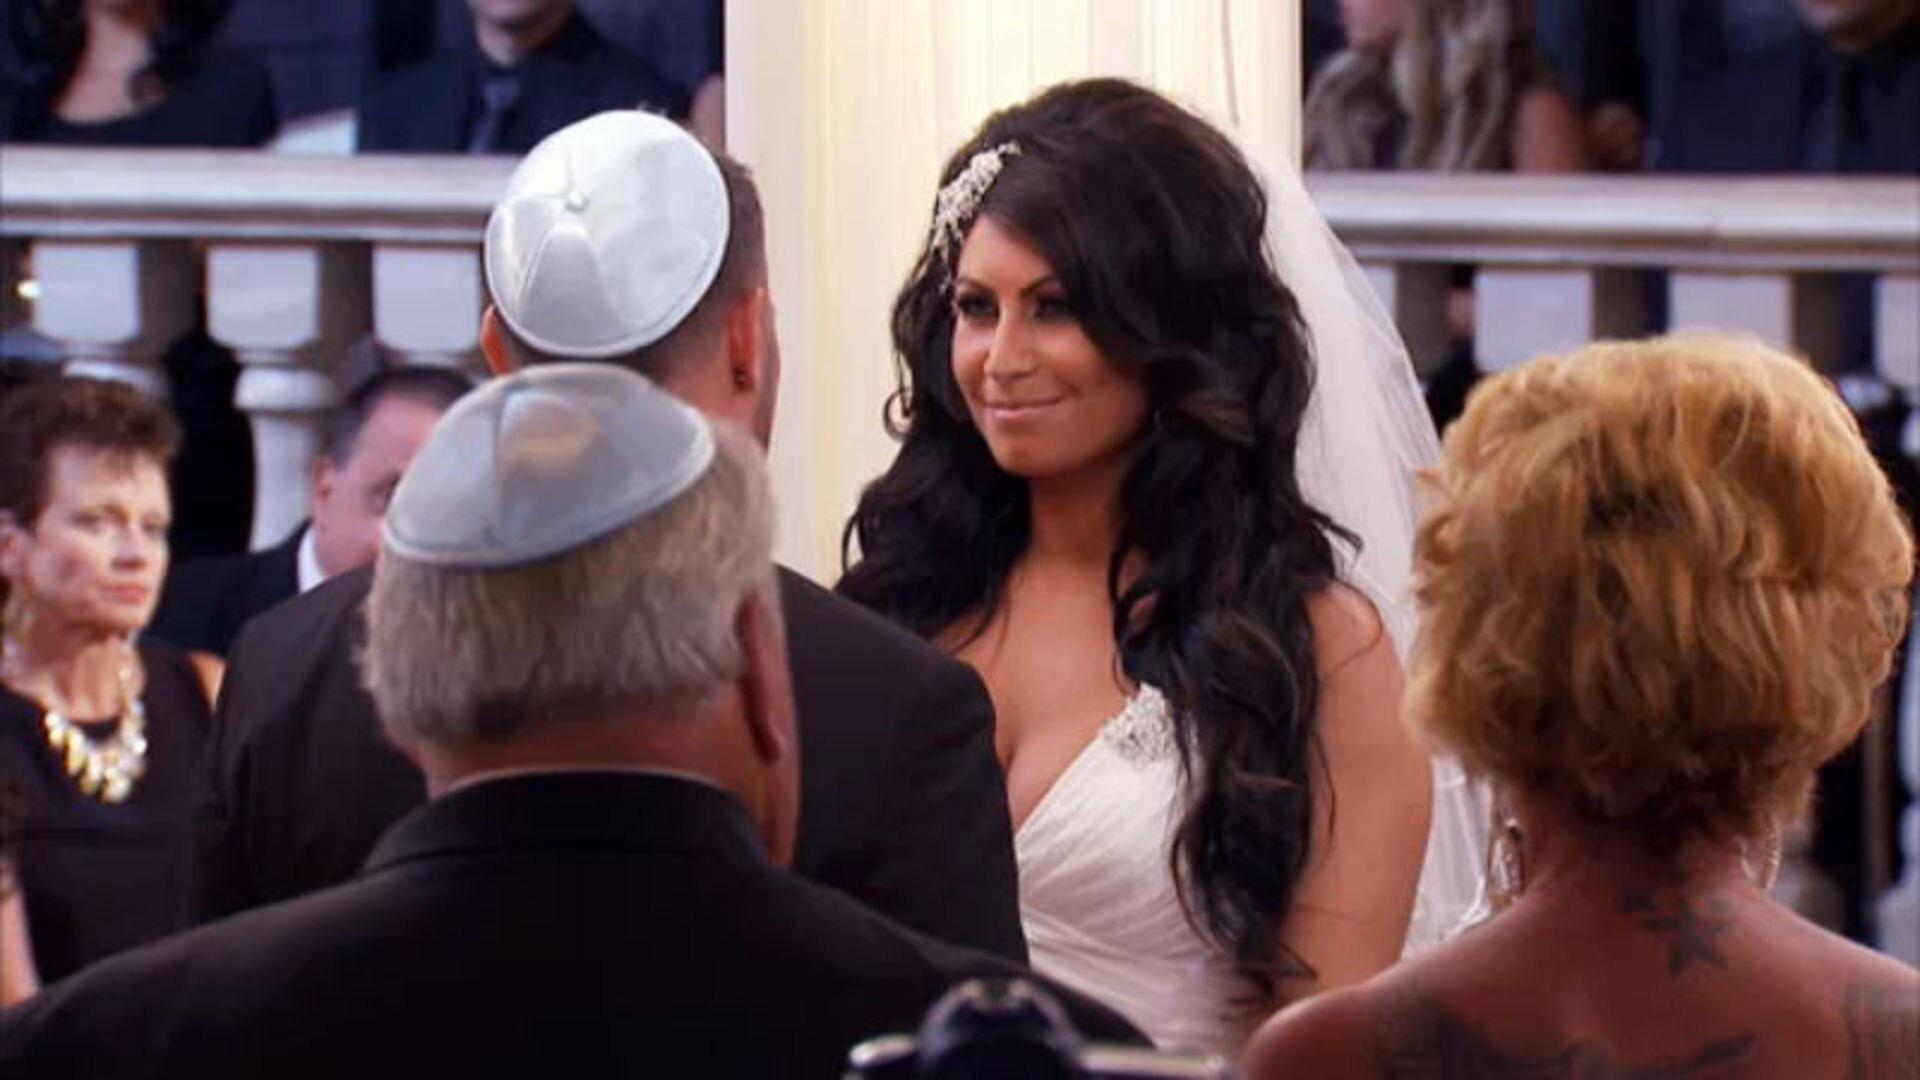 A Very Jersey Wedding